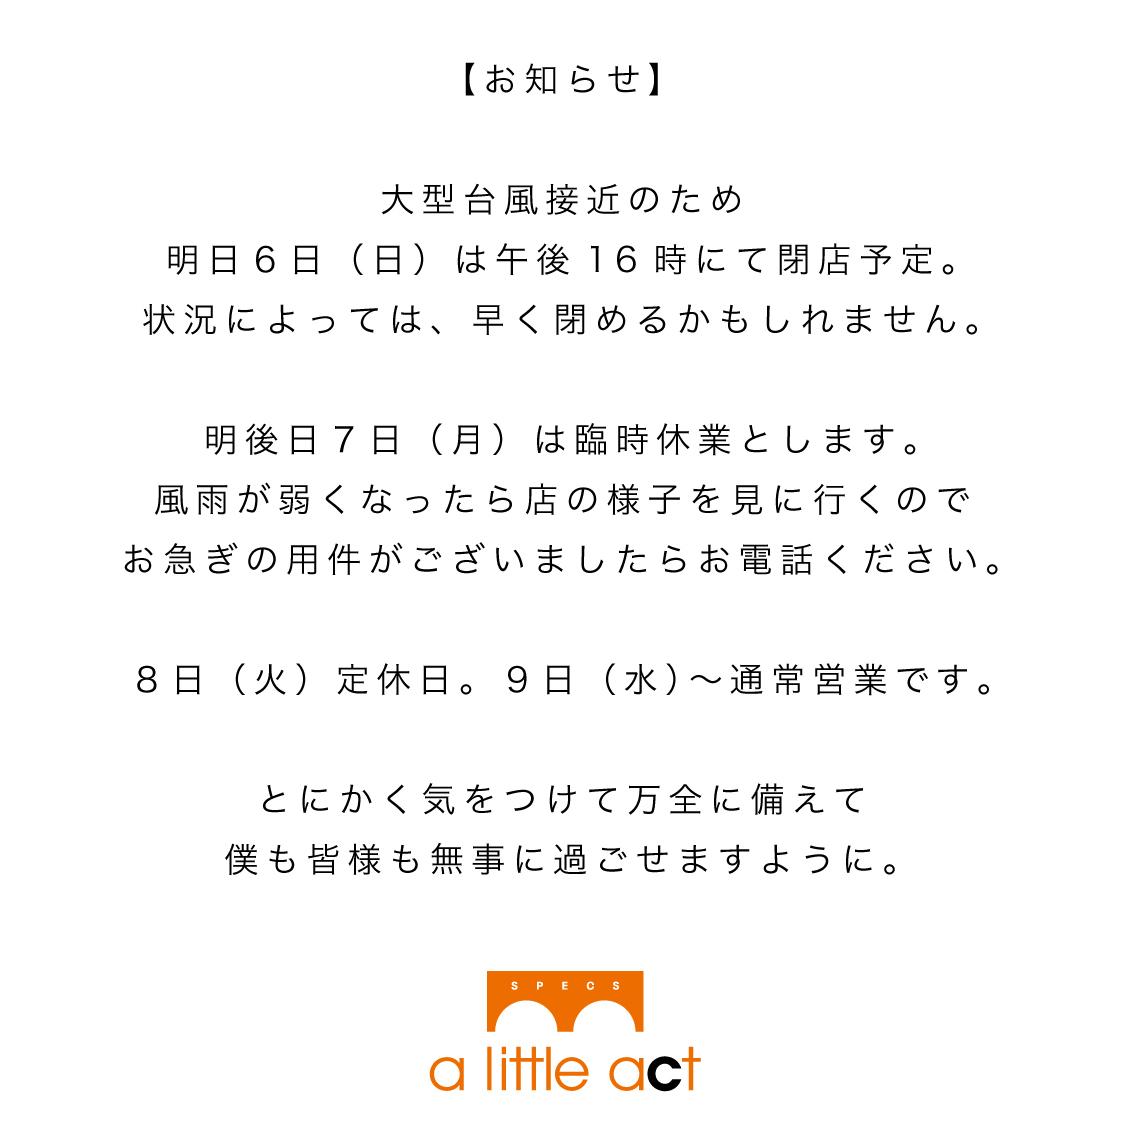 f:id:alittleact:20200905190440j:plain